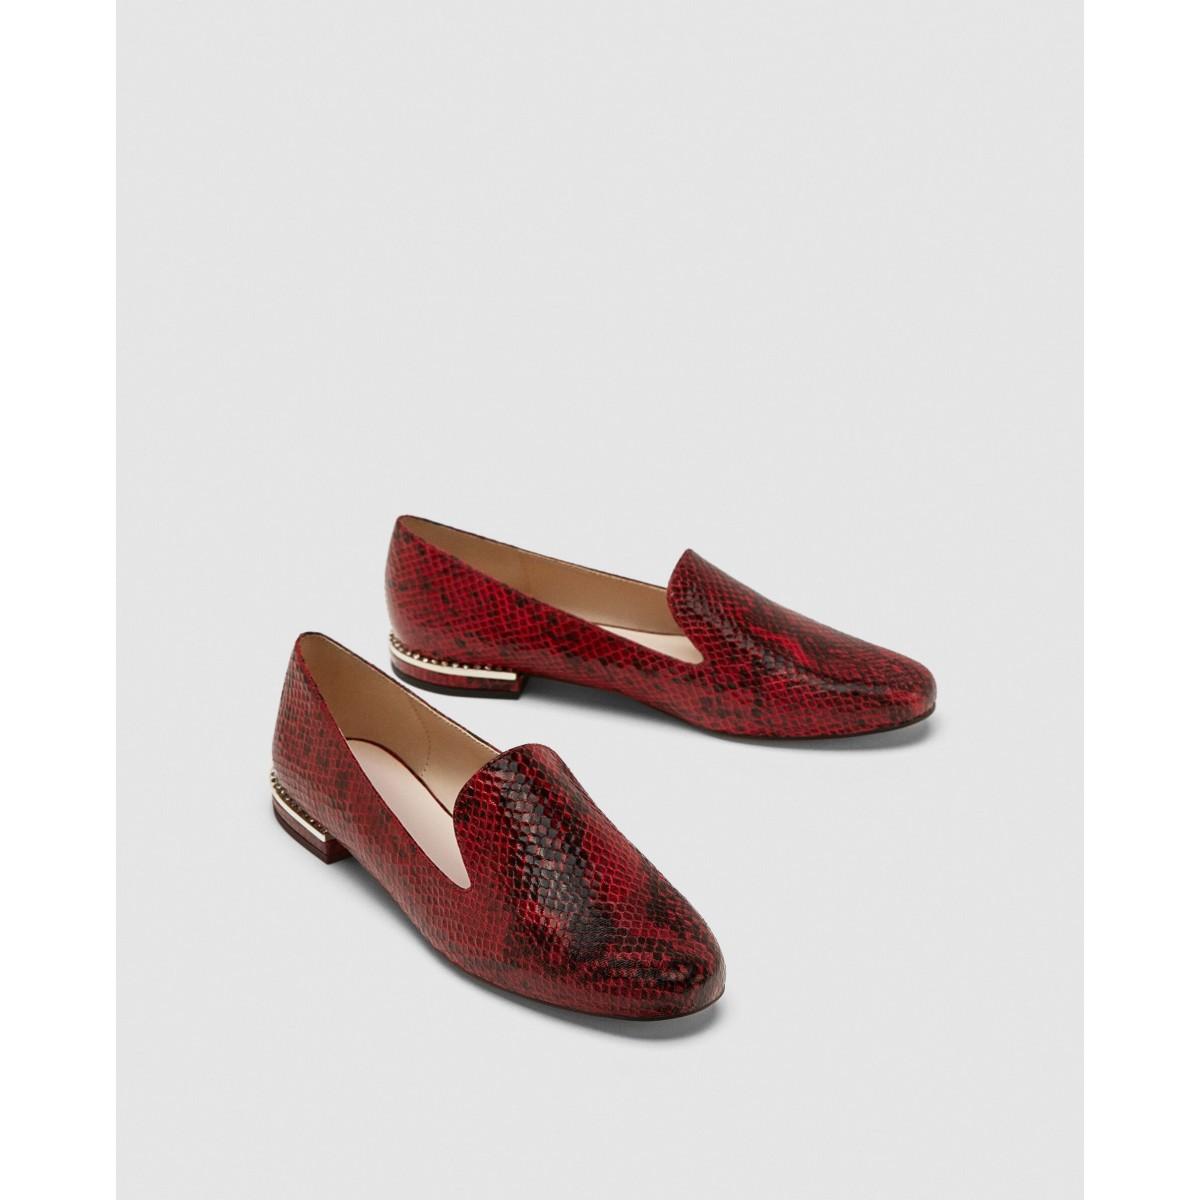 Zara Flat Embossed Shoes With Heel Detail